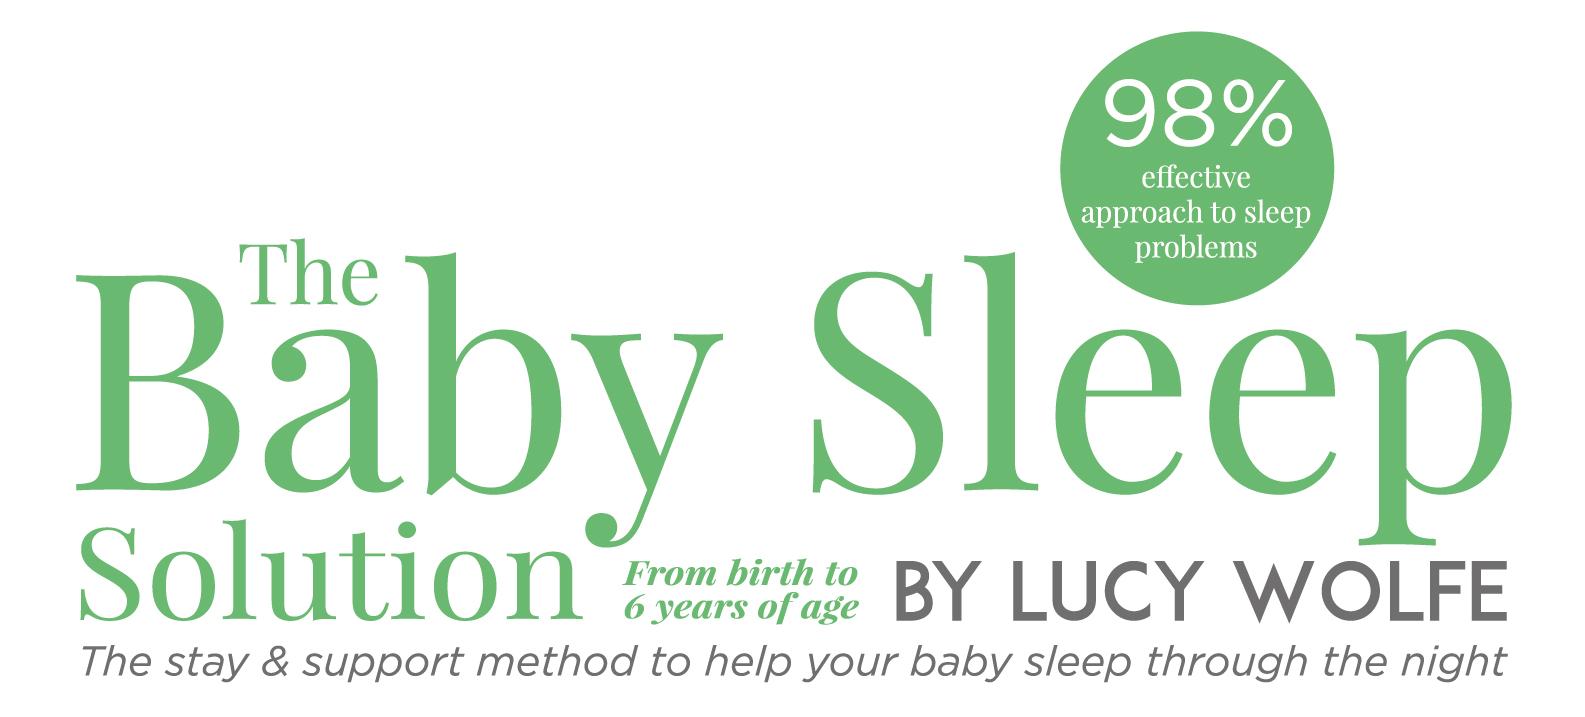 Baby Sleep Solution Brand-01.jpg